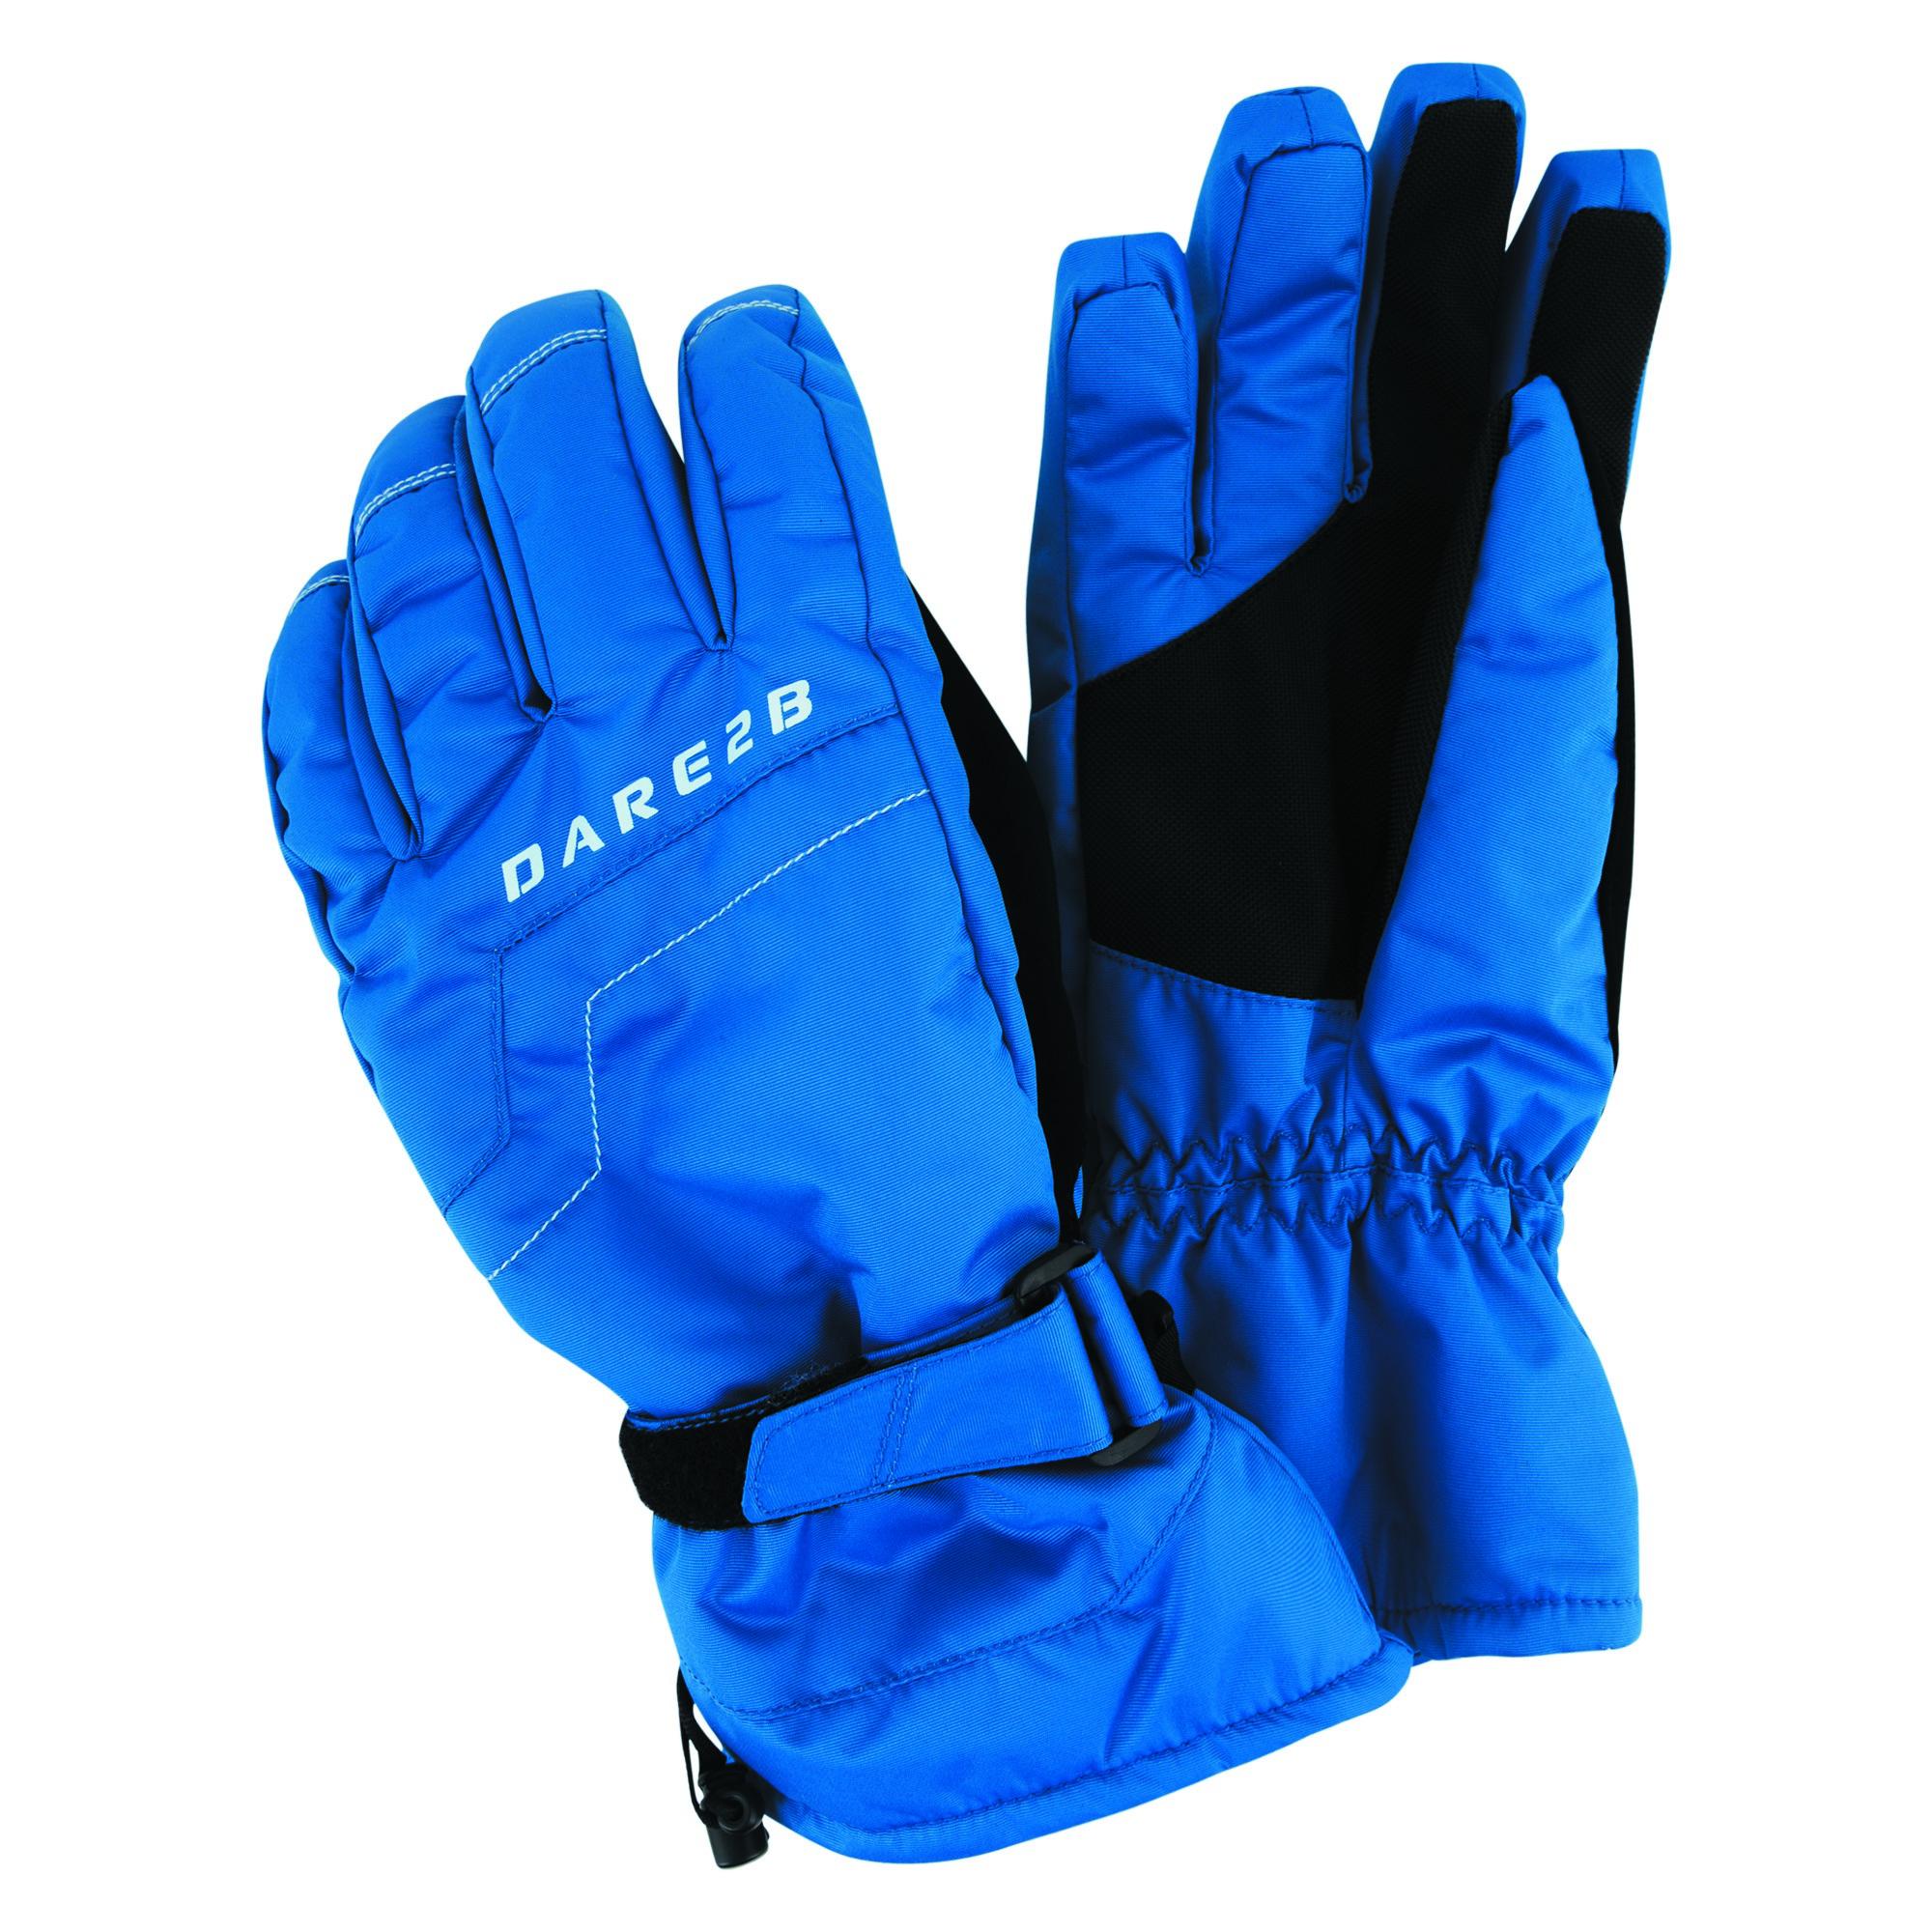 Mens ski gloves xl - Dare 2b Mens Summon Waterproof Ski Gloves 2